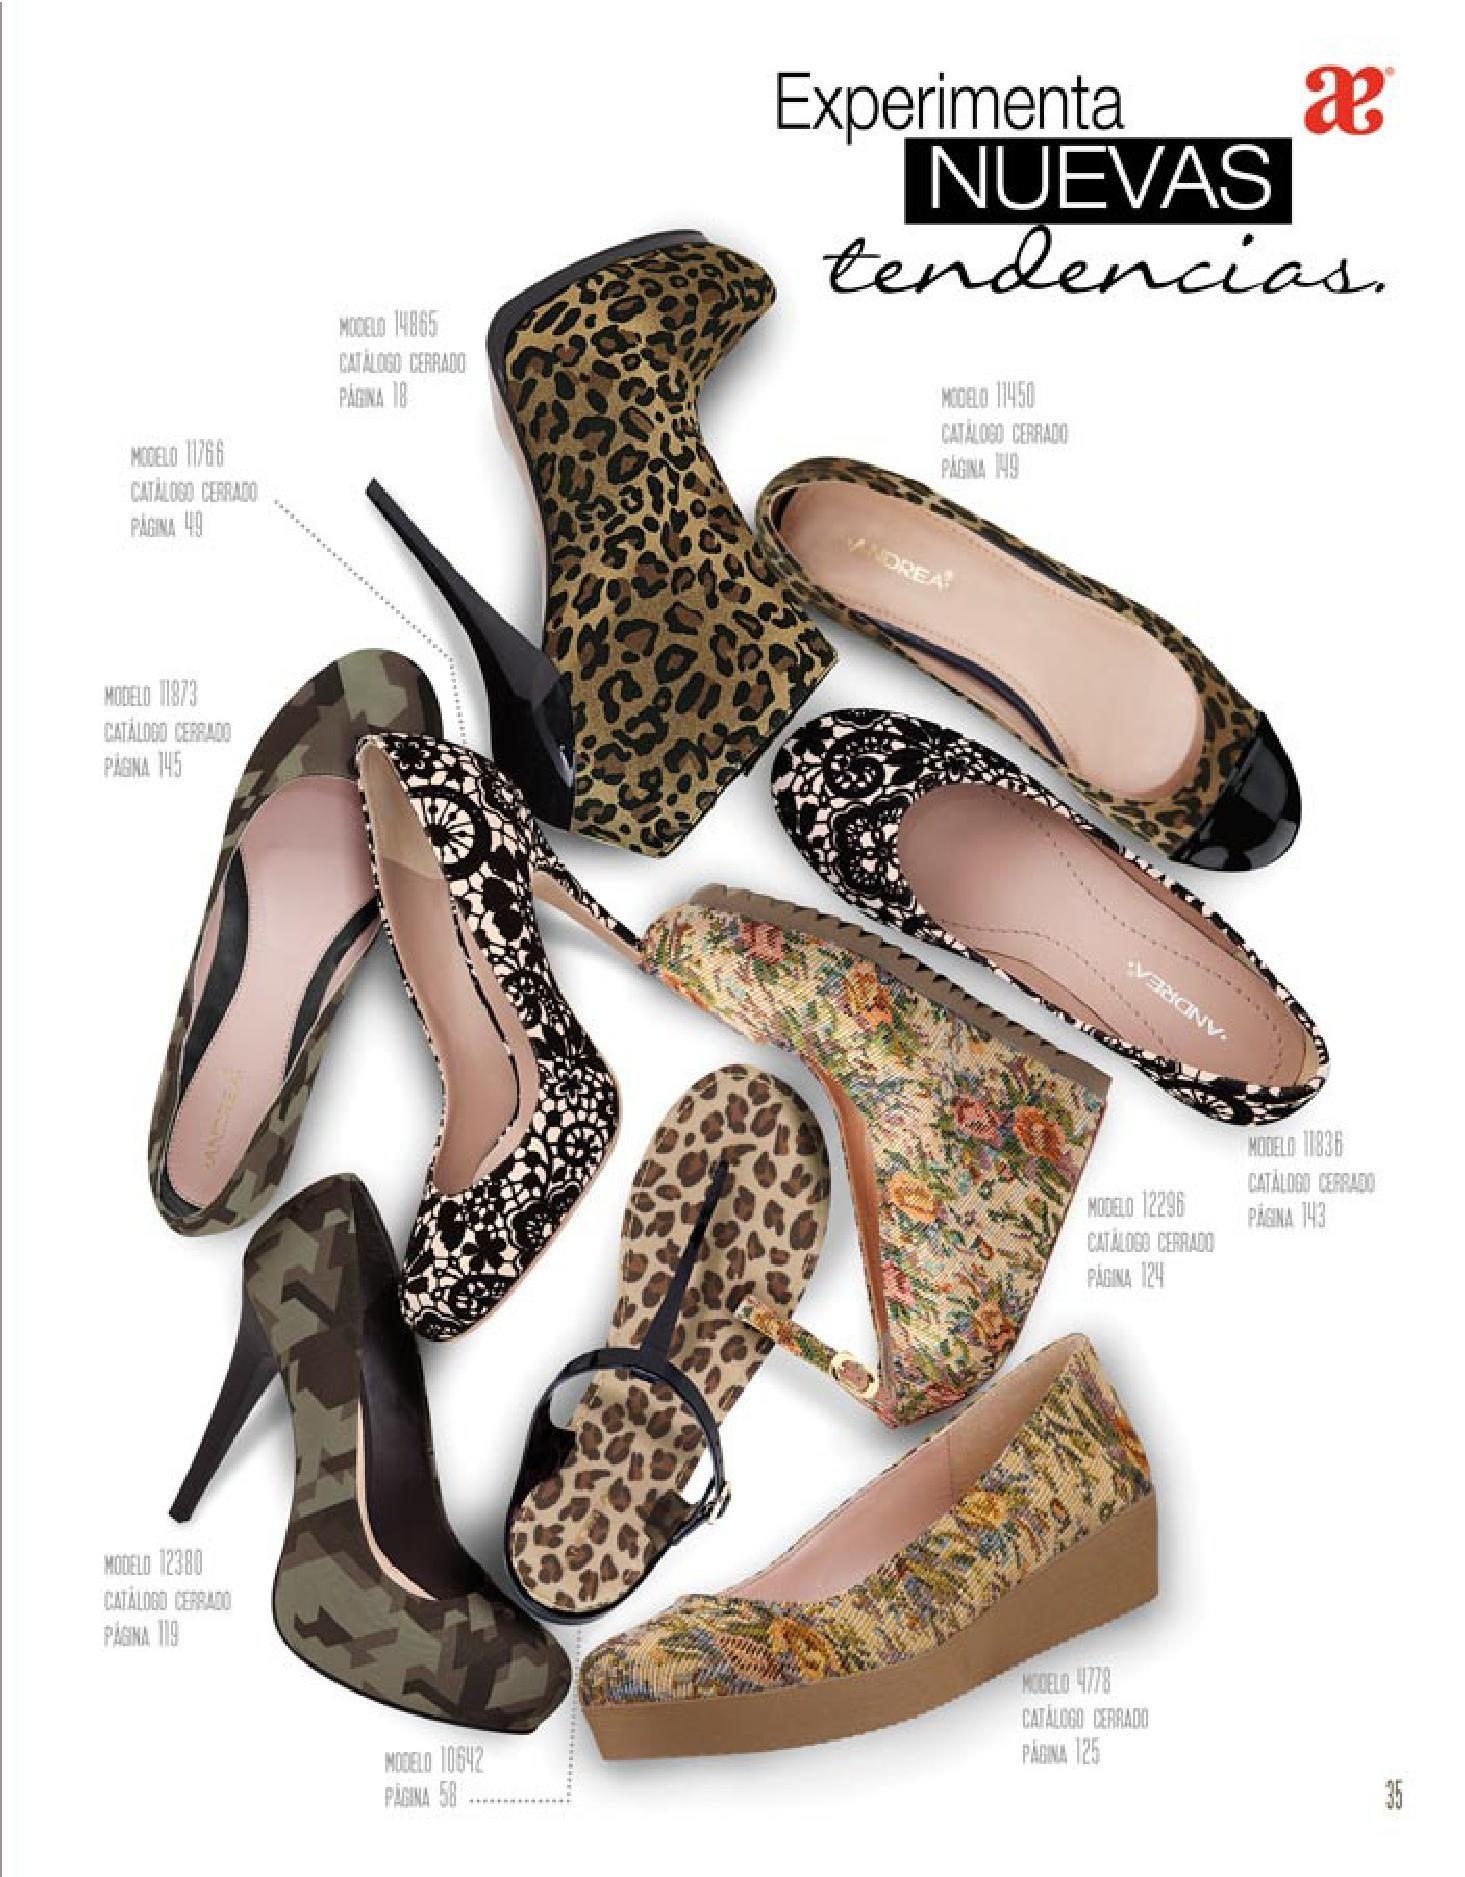 Sandalias Trend Moda Ropa Andrea Catalogo Fashion Monterrey Heels Shoes Fashion